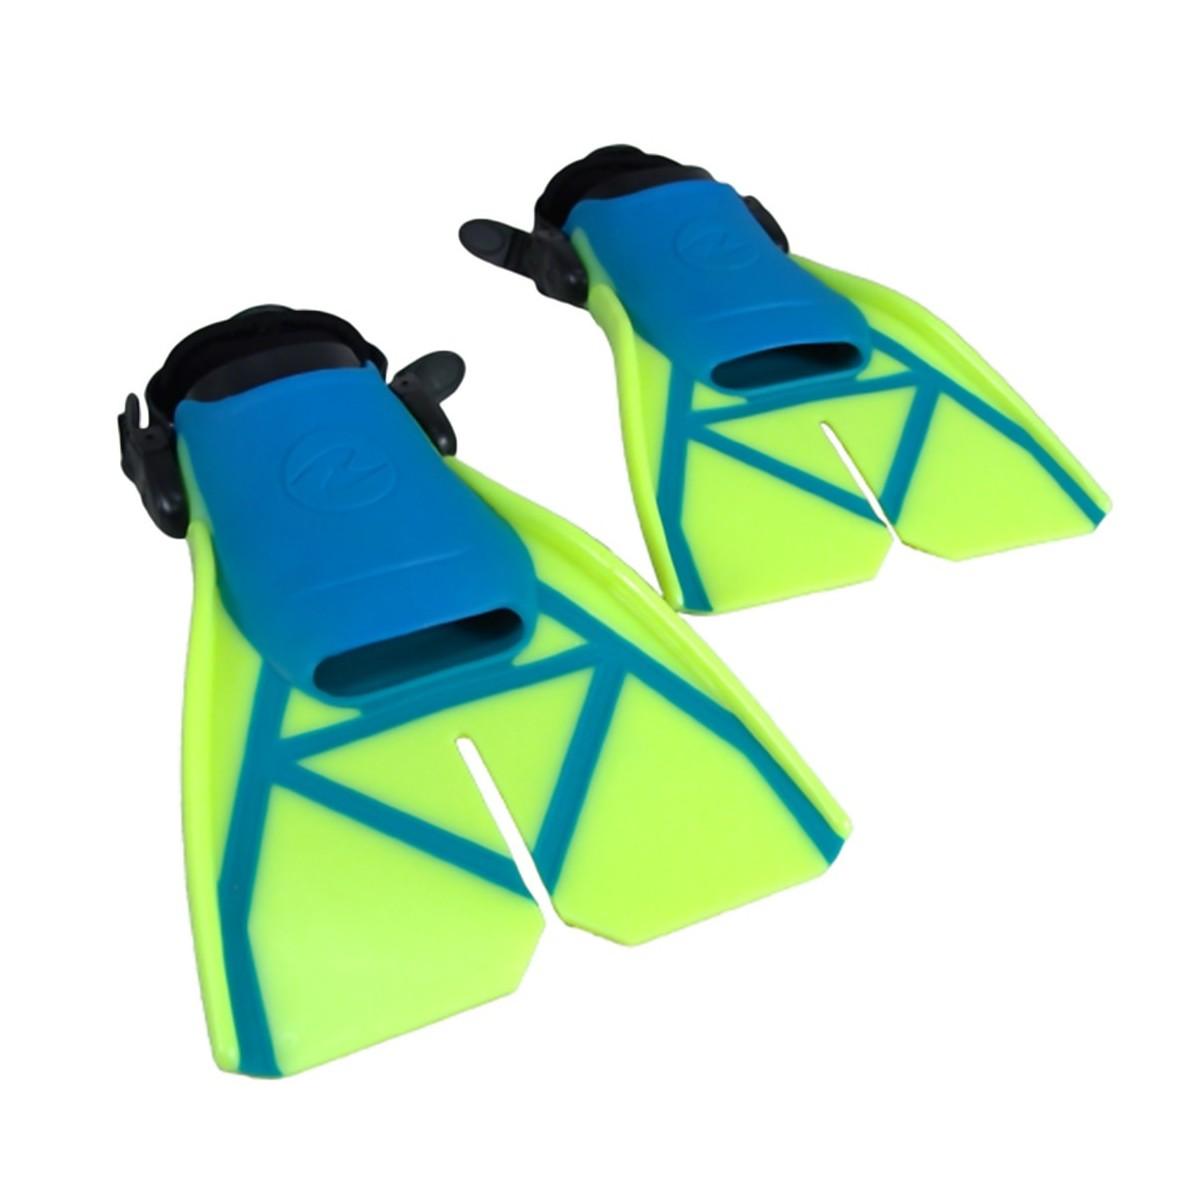 Aqua Sphere Zip Fitness Swim Fins